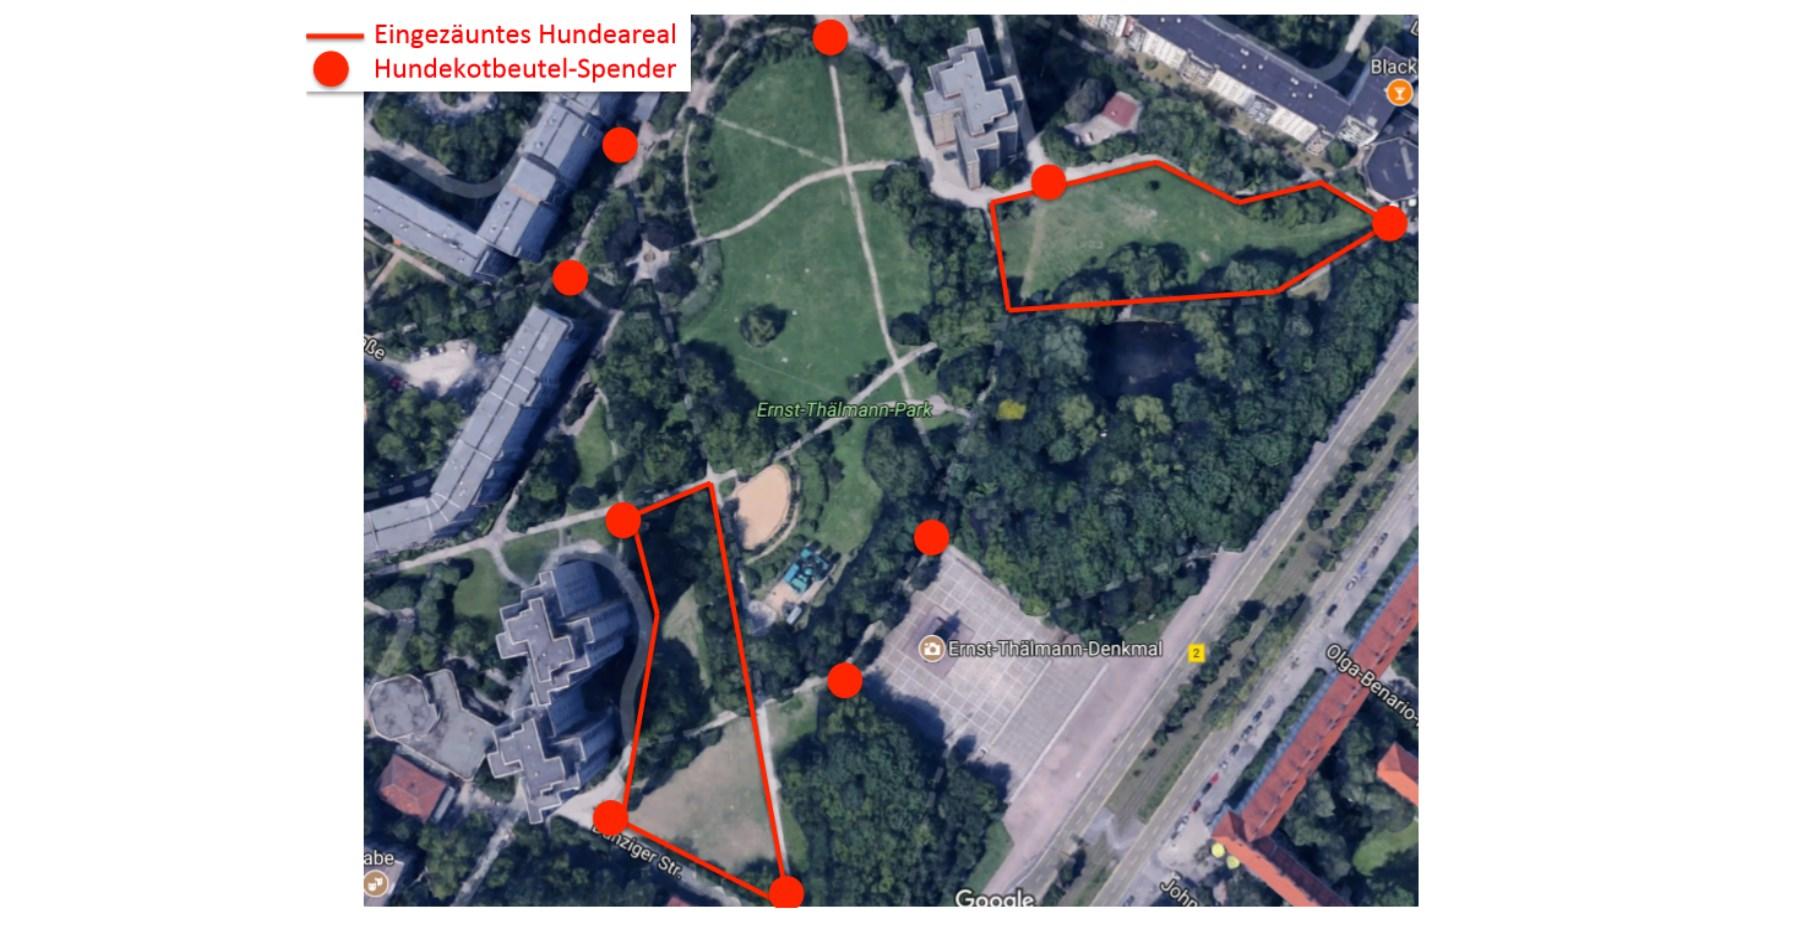 Zwei Auslaufgebiete fordert die Petition - und viele, viele Hundekotbeutelspender (Grafik: Fabian Kröll)